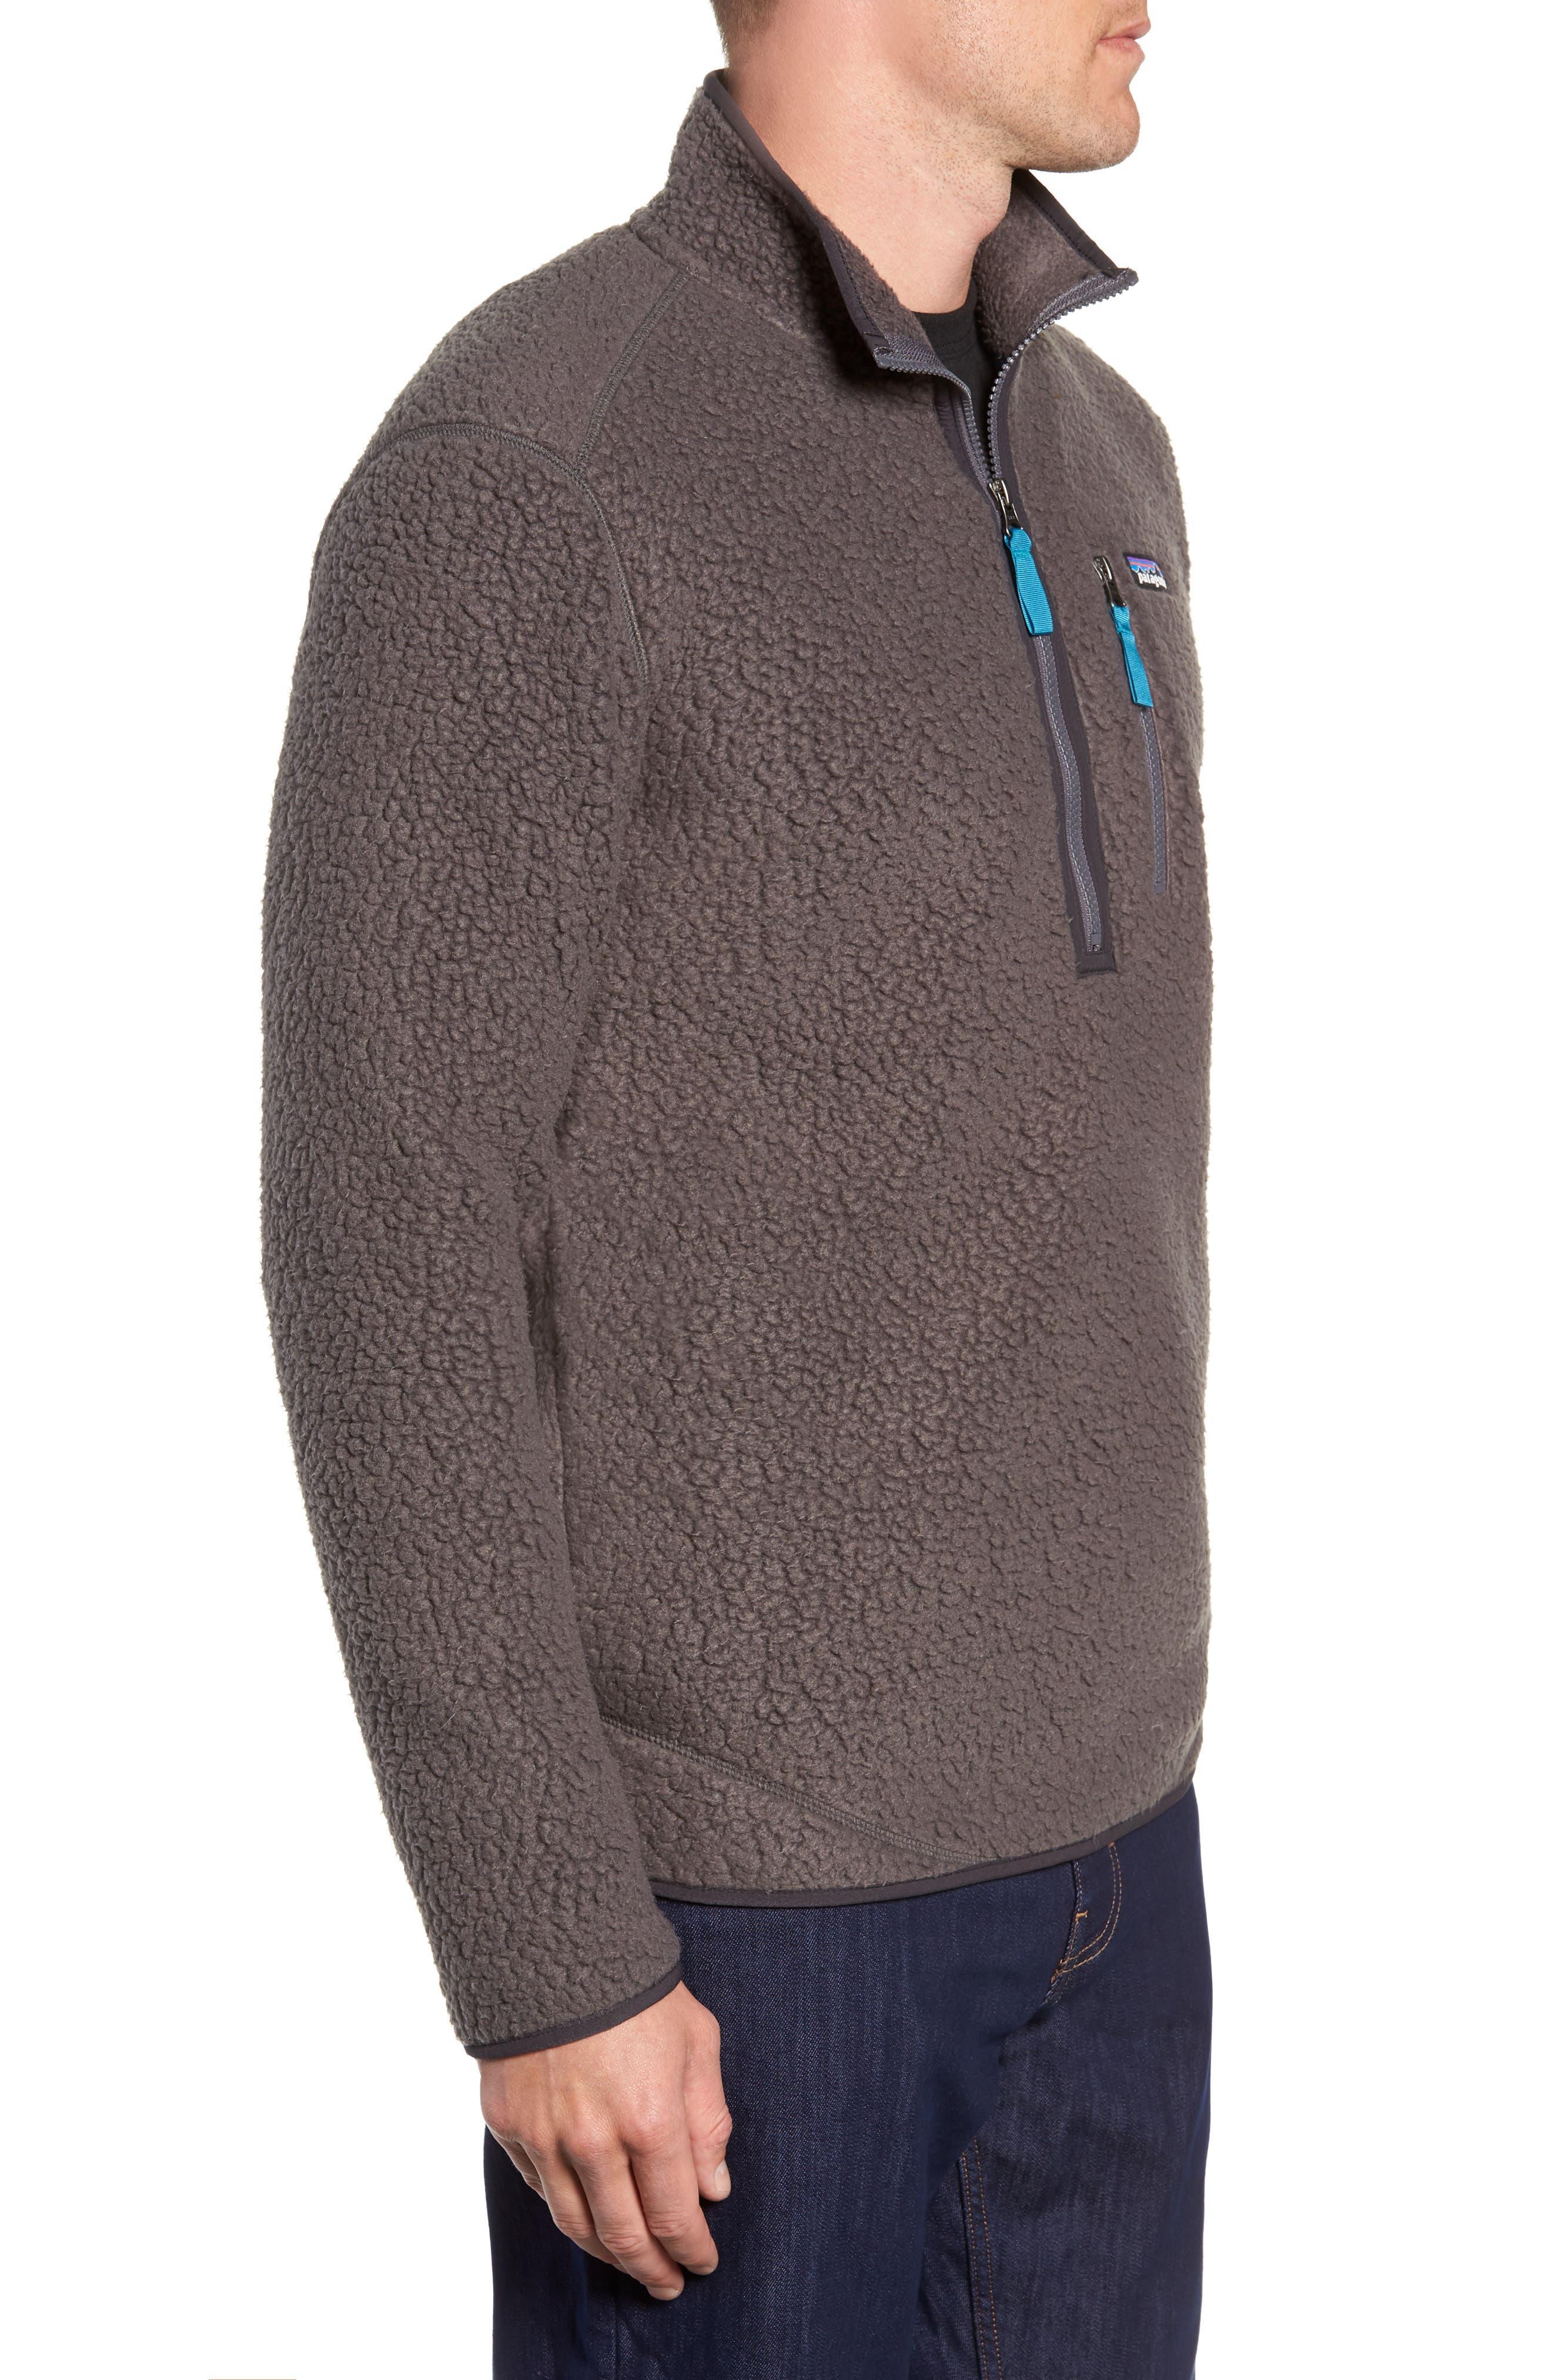 Retro Pile Fleece Zip Jacket,                             Alternate thumbnail 3, color,                             FORGE GREY